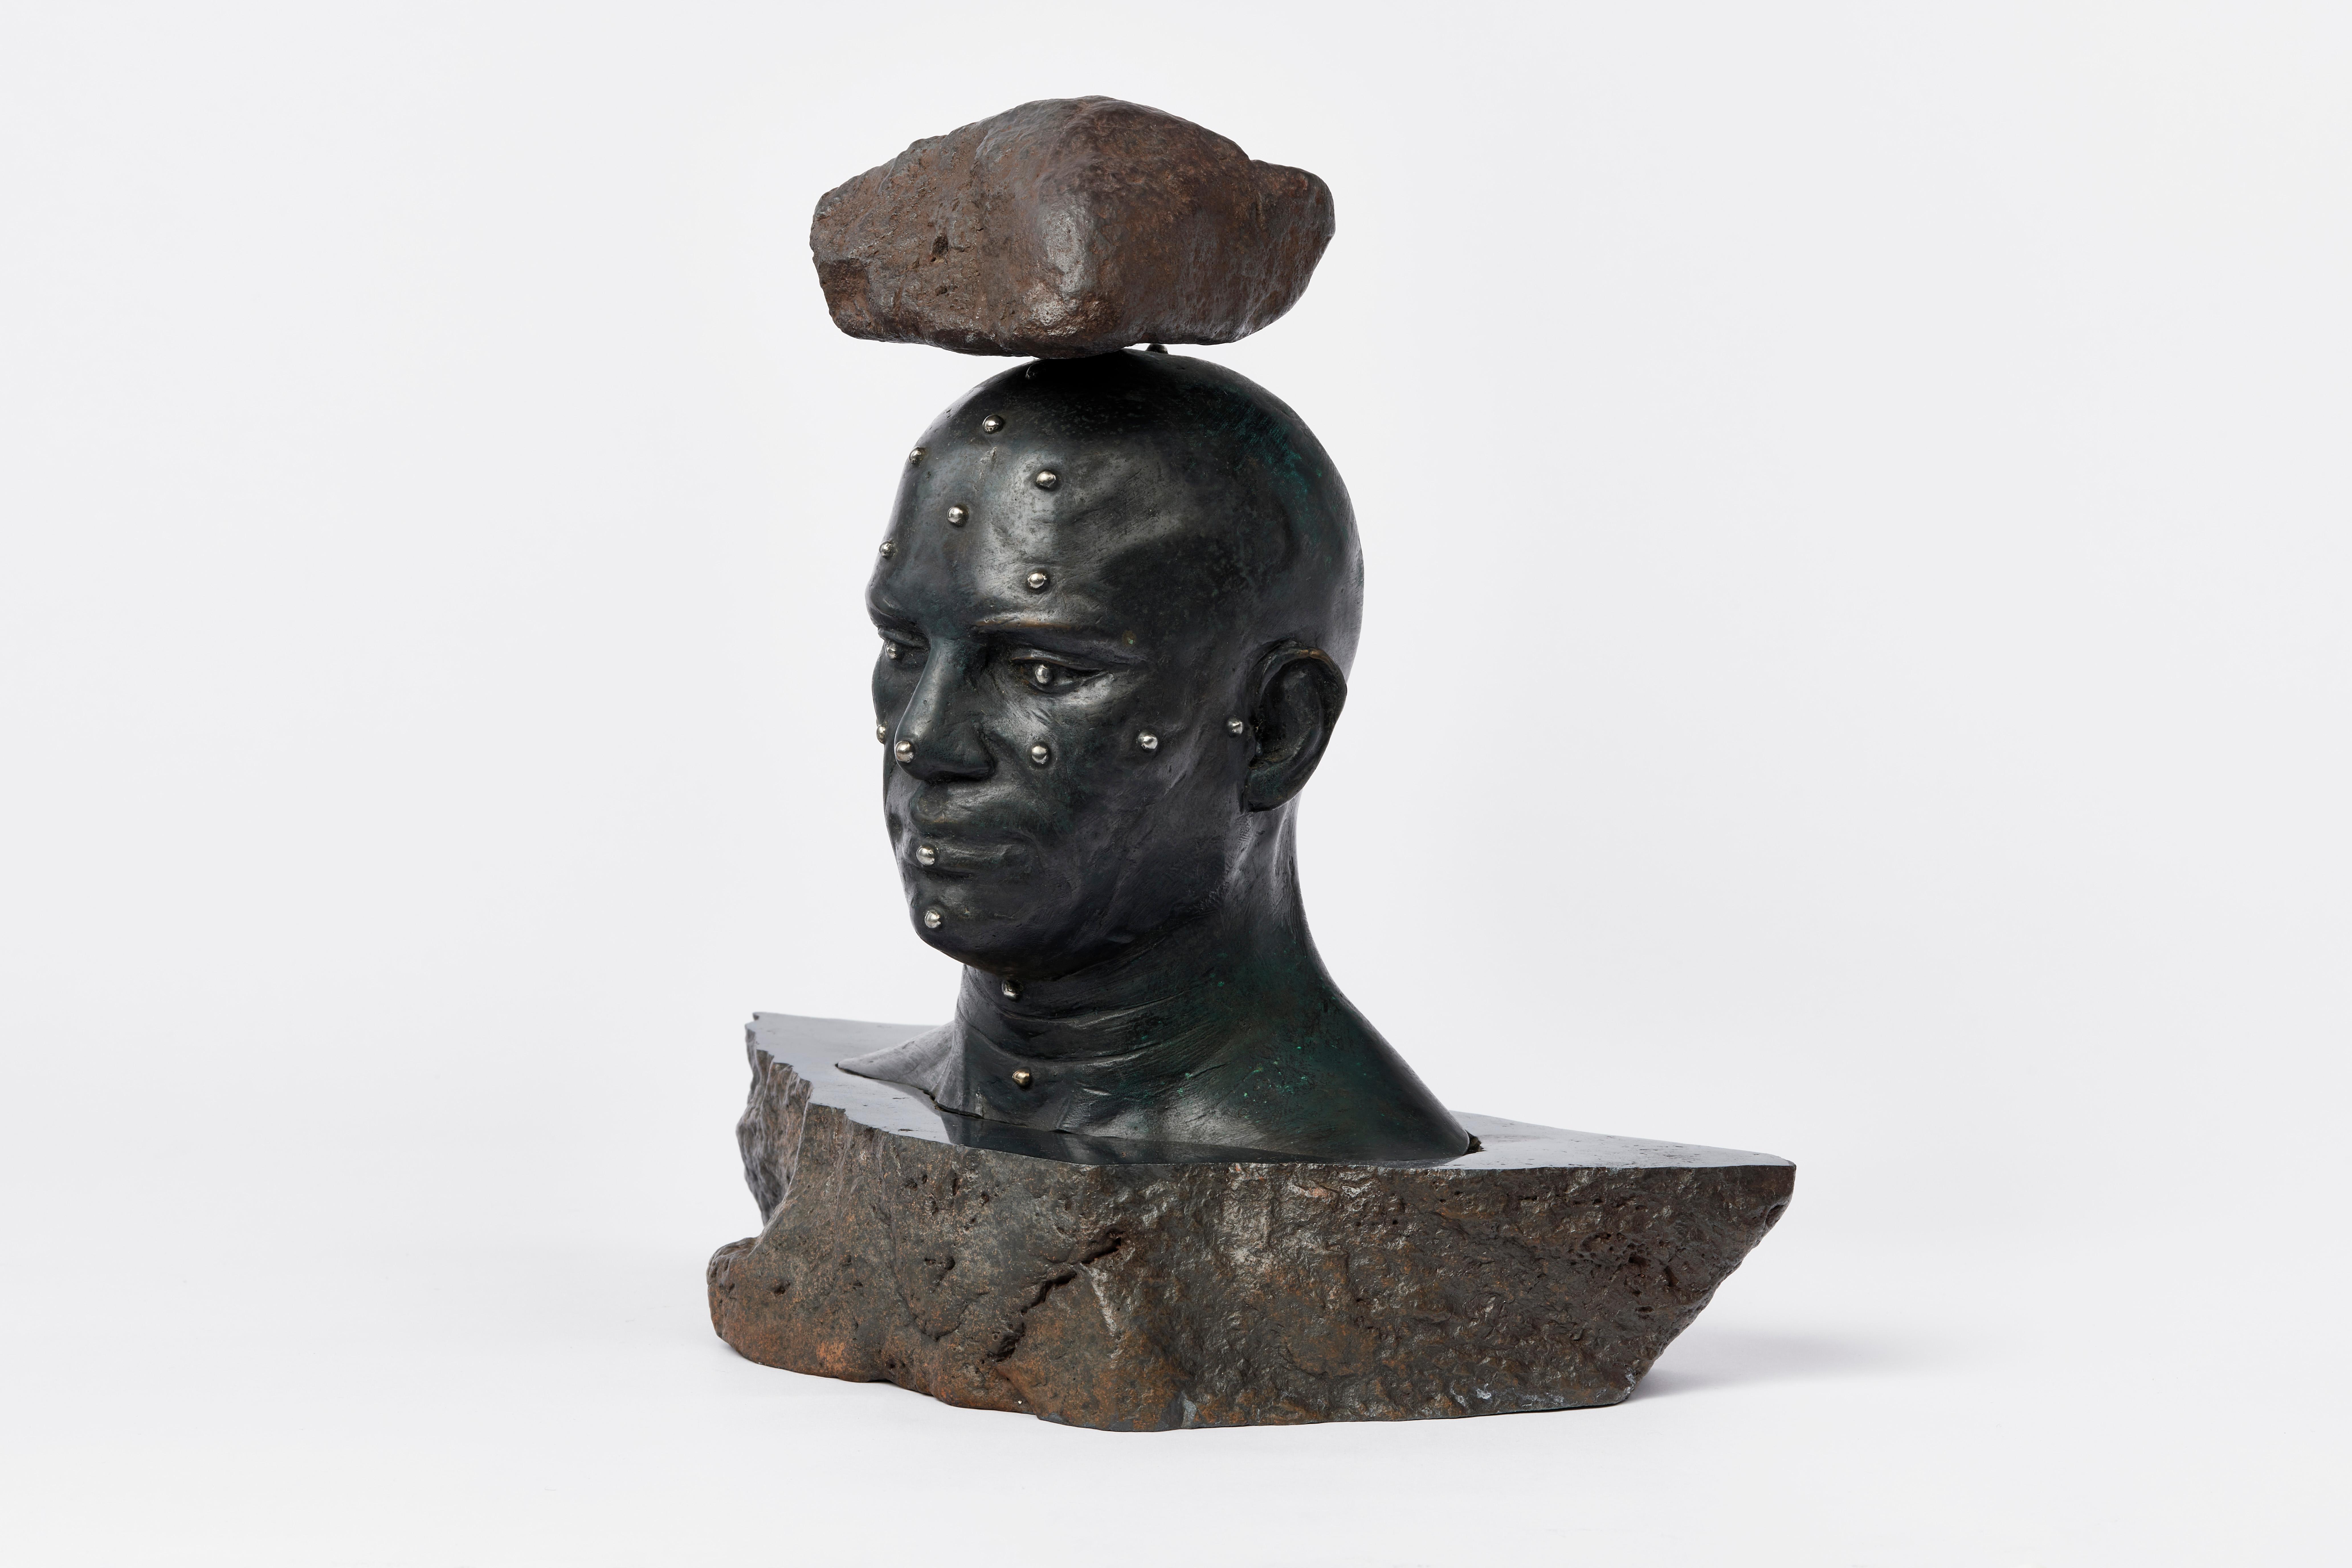 Angus Taylor, Head